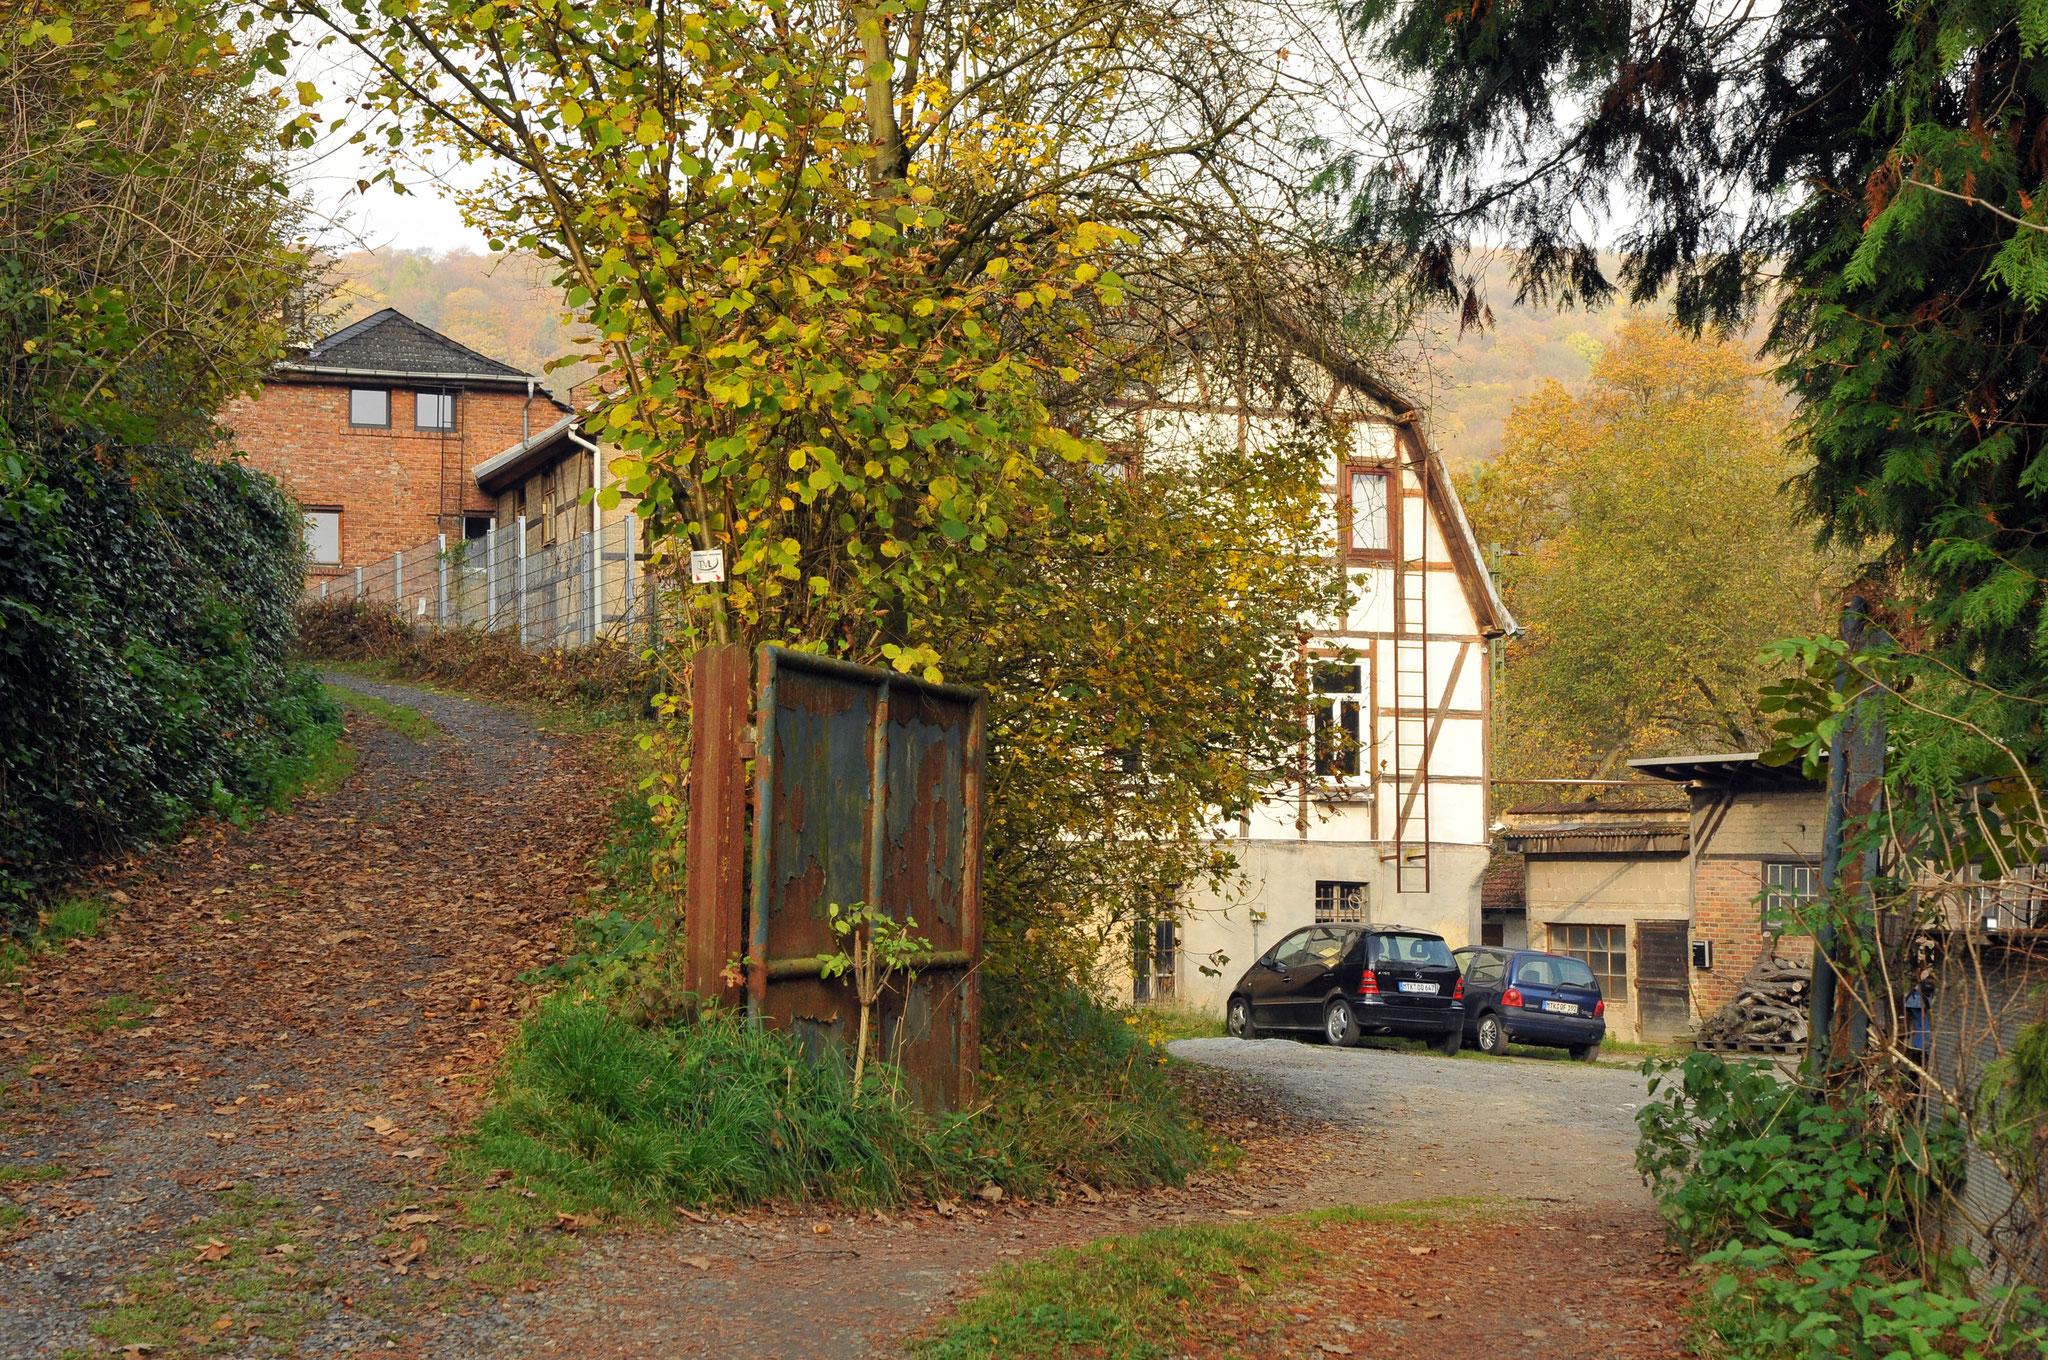 Zufahrt zur Lederfabrik Rühl